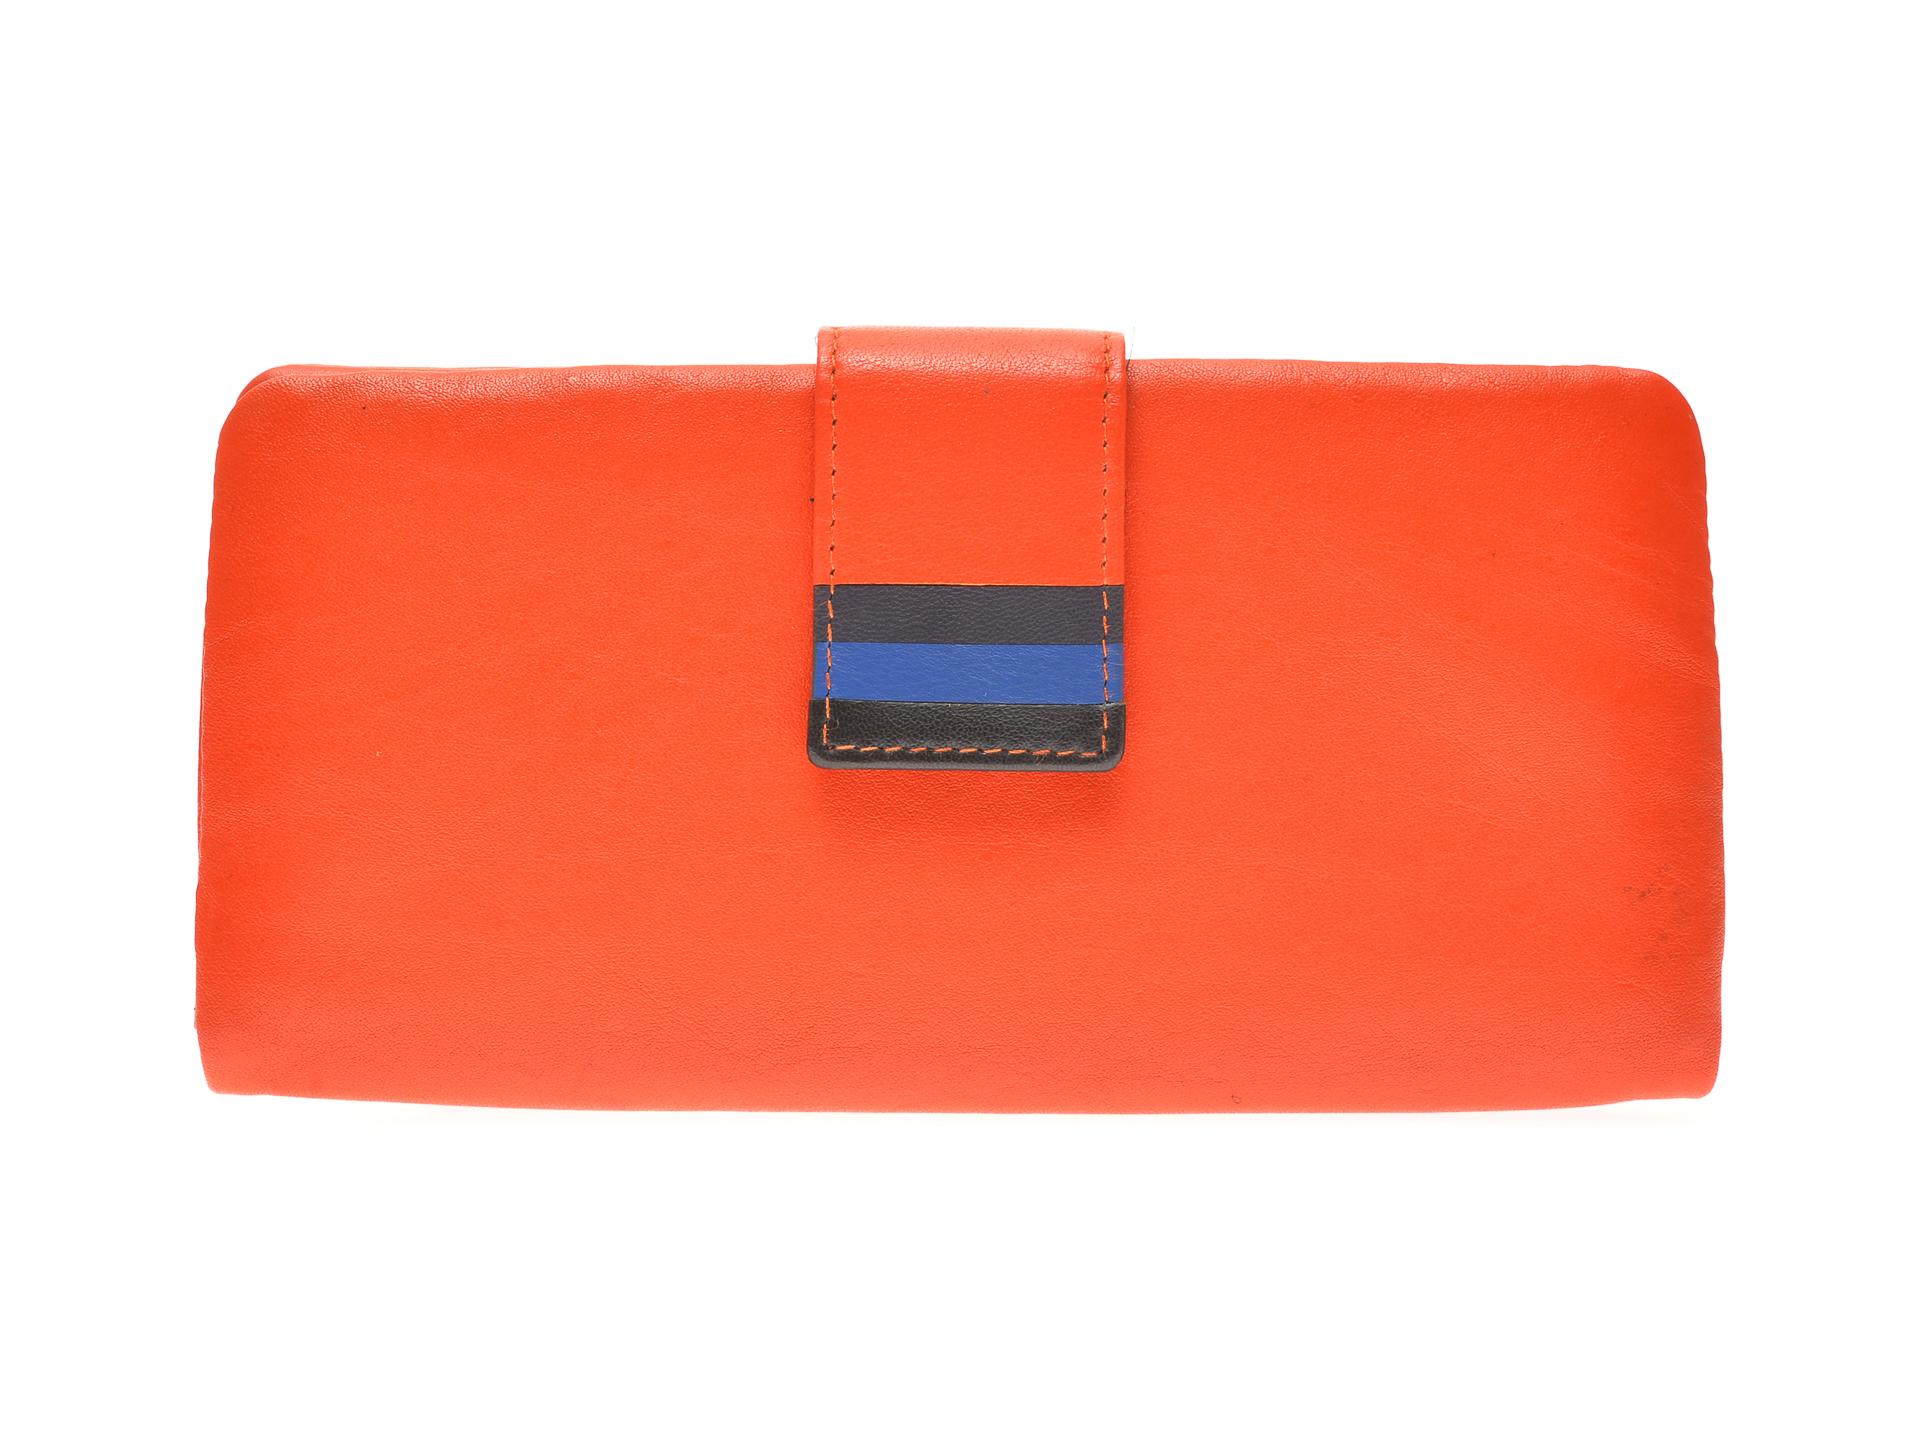 Portofel EPICA portocaliu, 7081, din piele naturala imagine otter.ro 2021